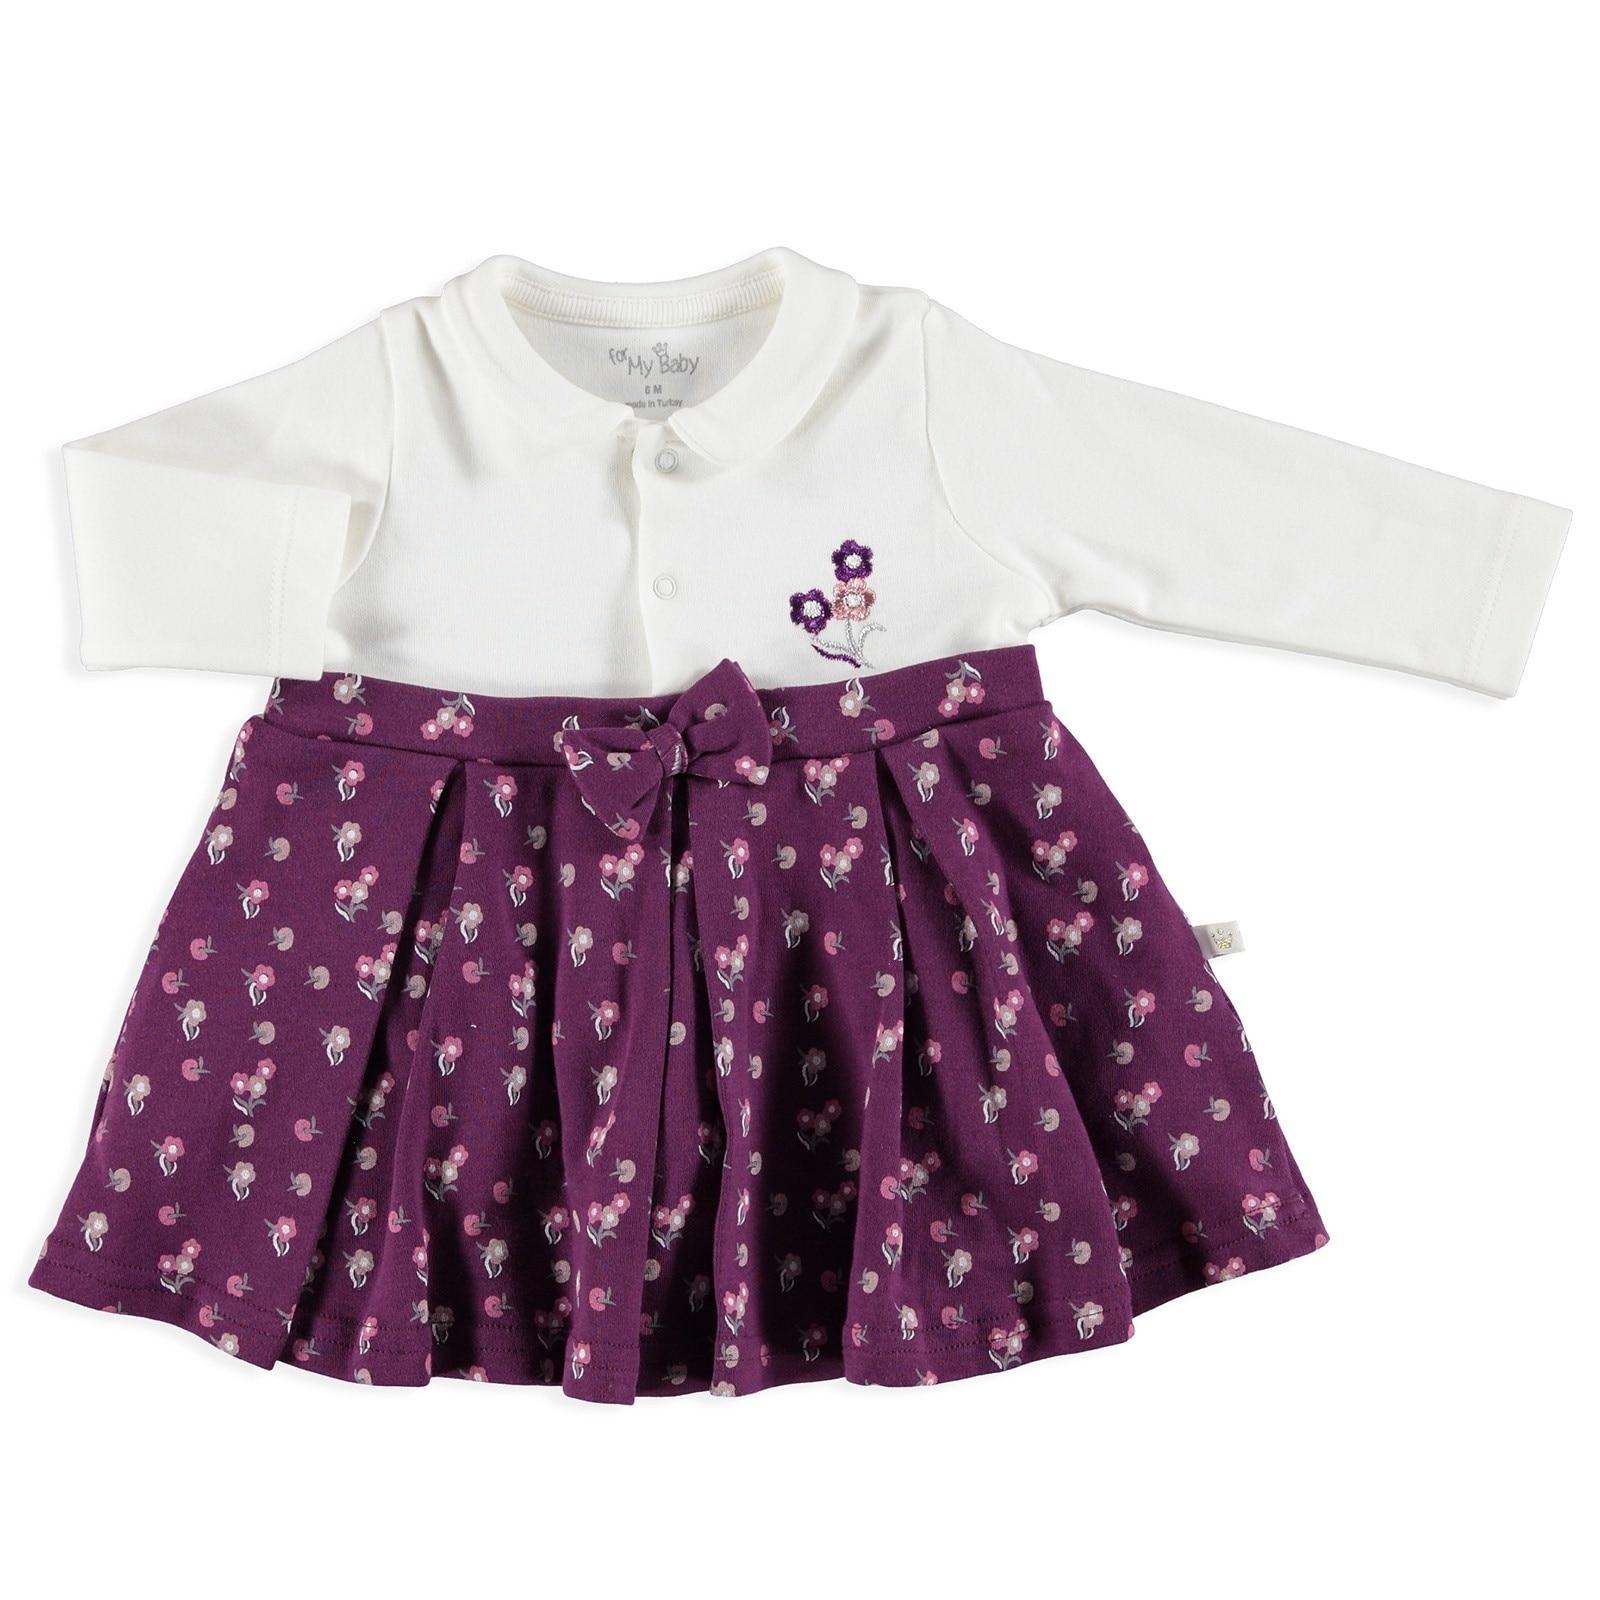 Ebebek For My Baby Winter Girl Cute Dress